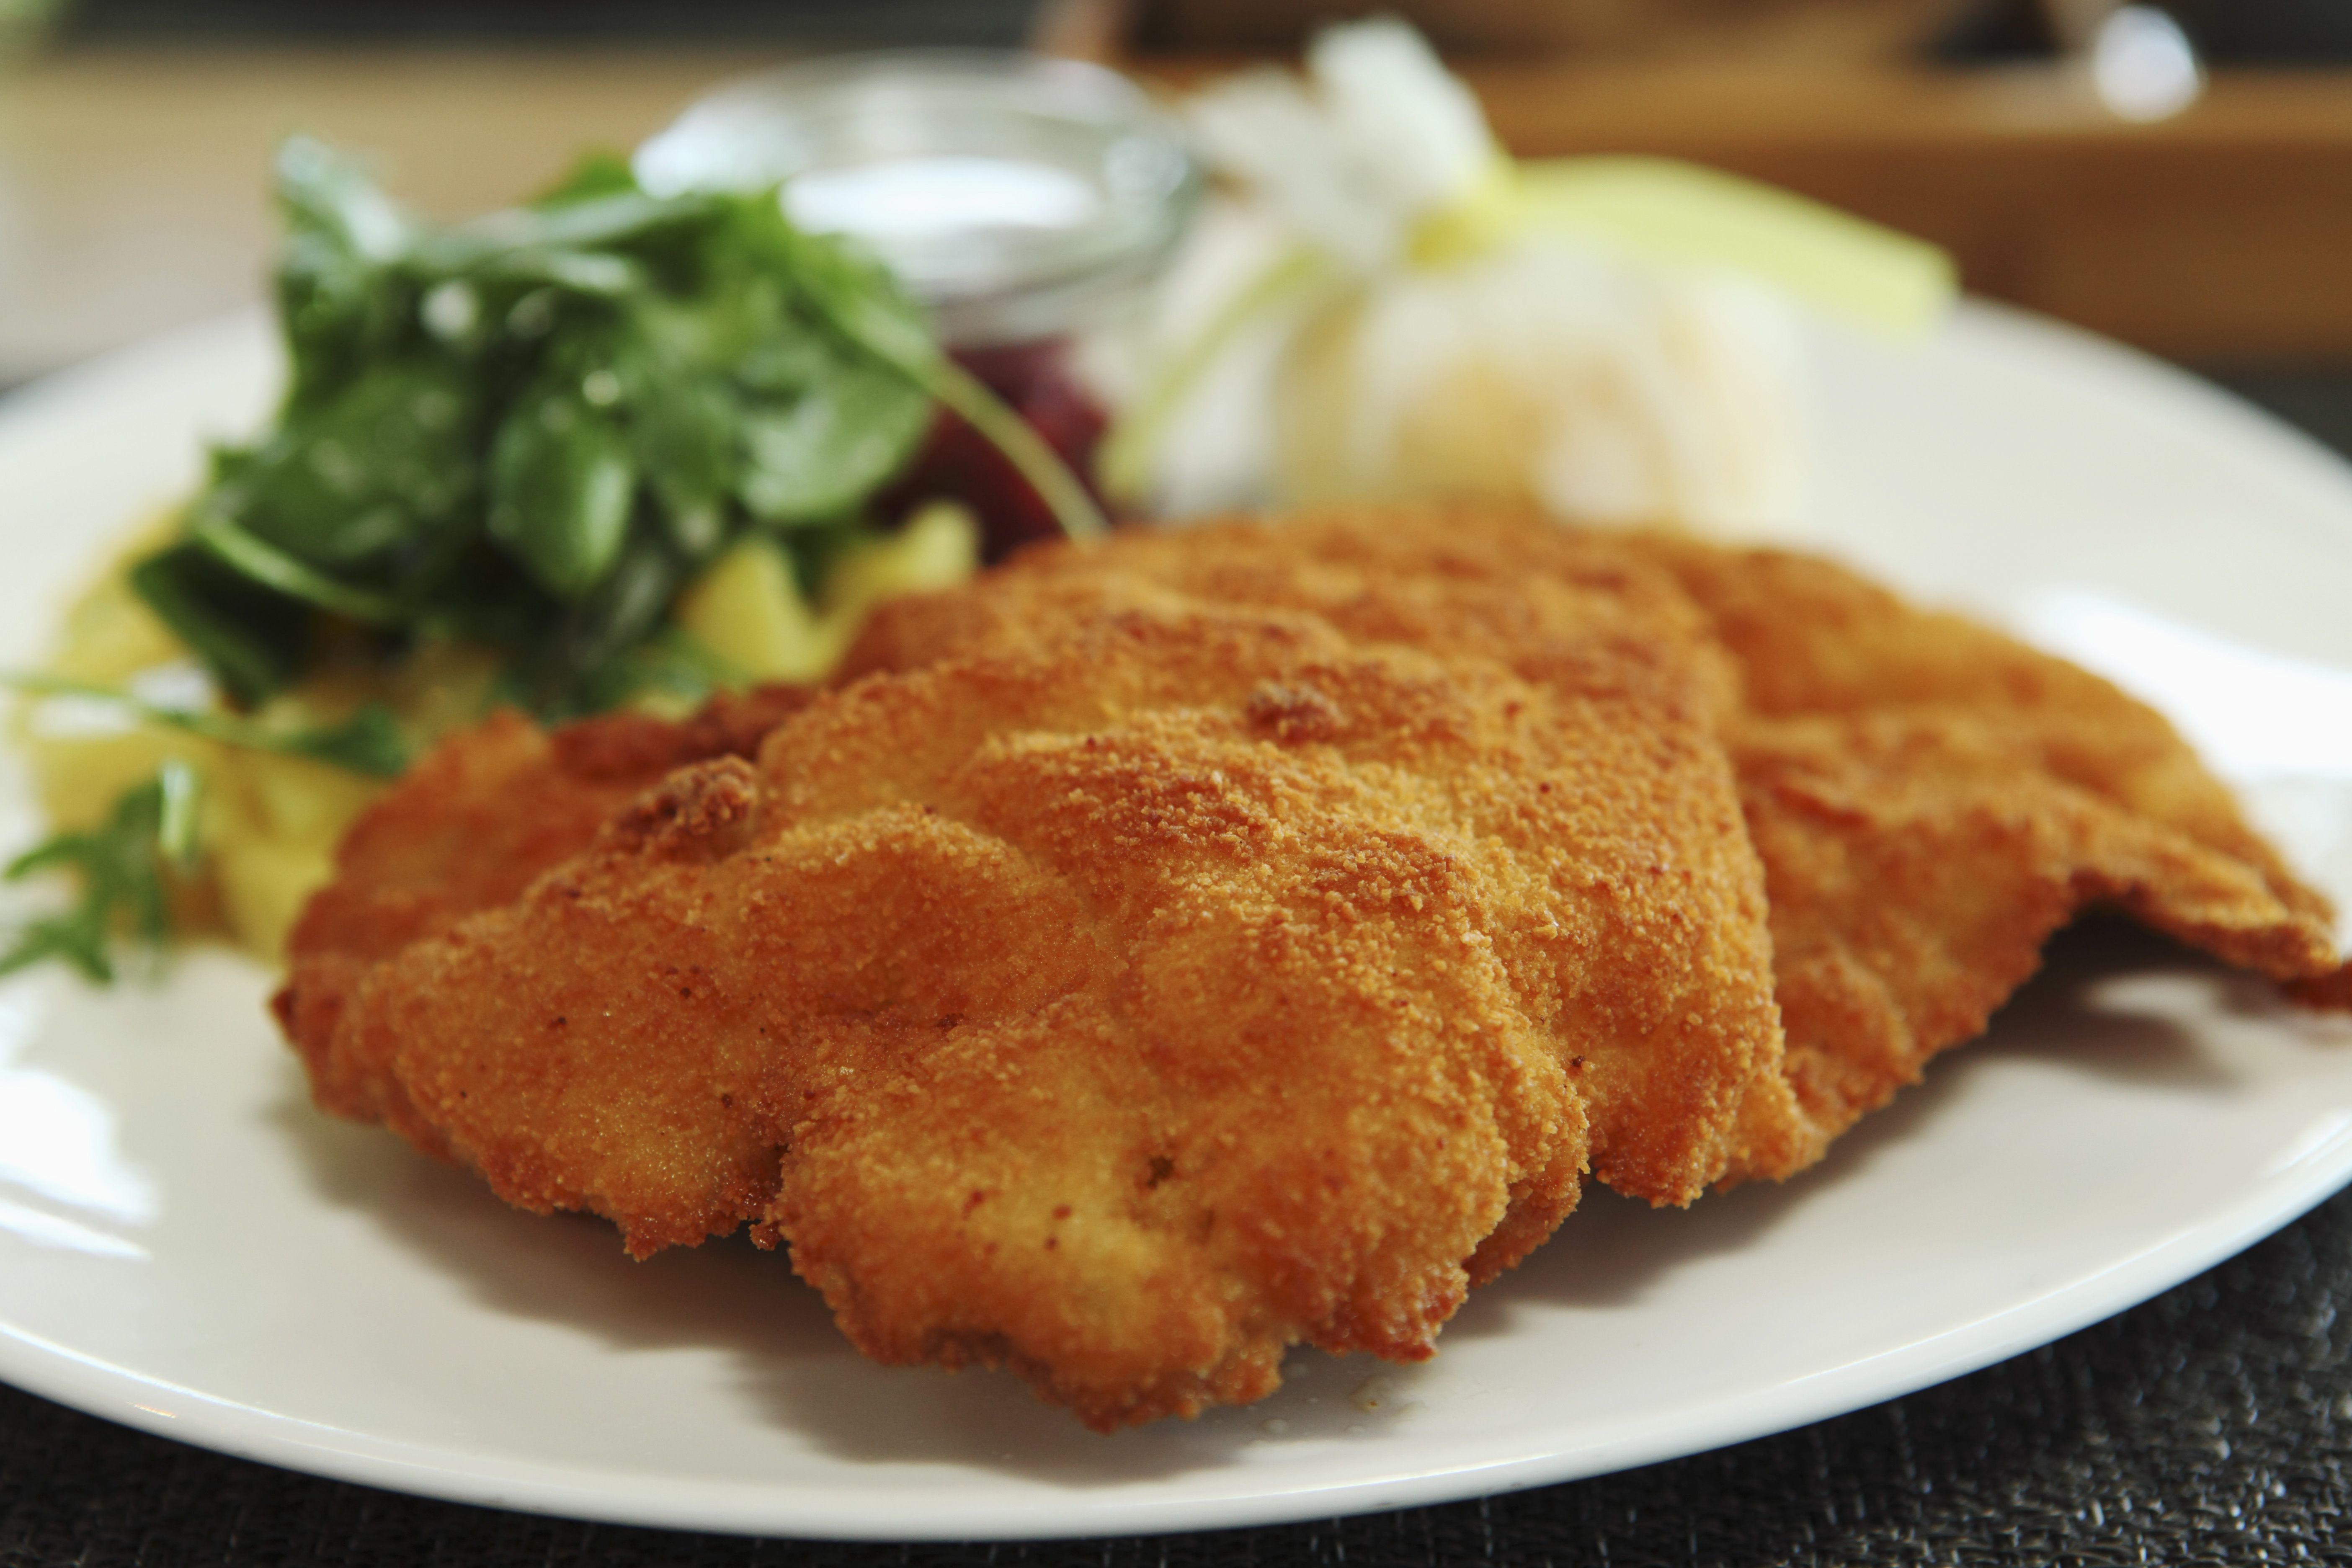 Breakfast Food Recipes From Germany